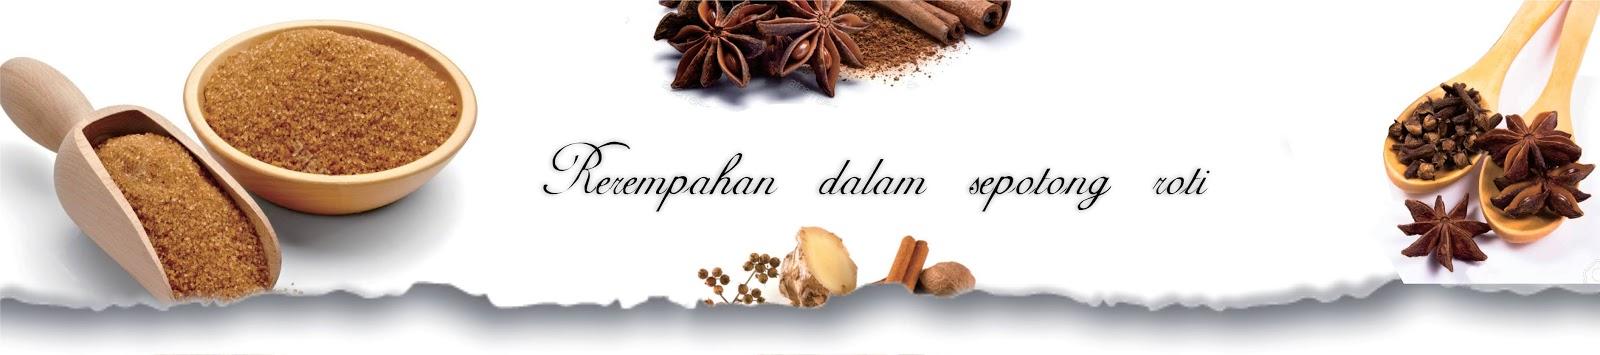 Ganjel Rel Semarang , Jual Ganjel Rel Semarang , Produsen Ganjel Rel Semarang